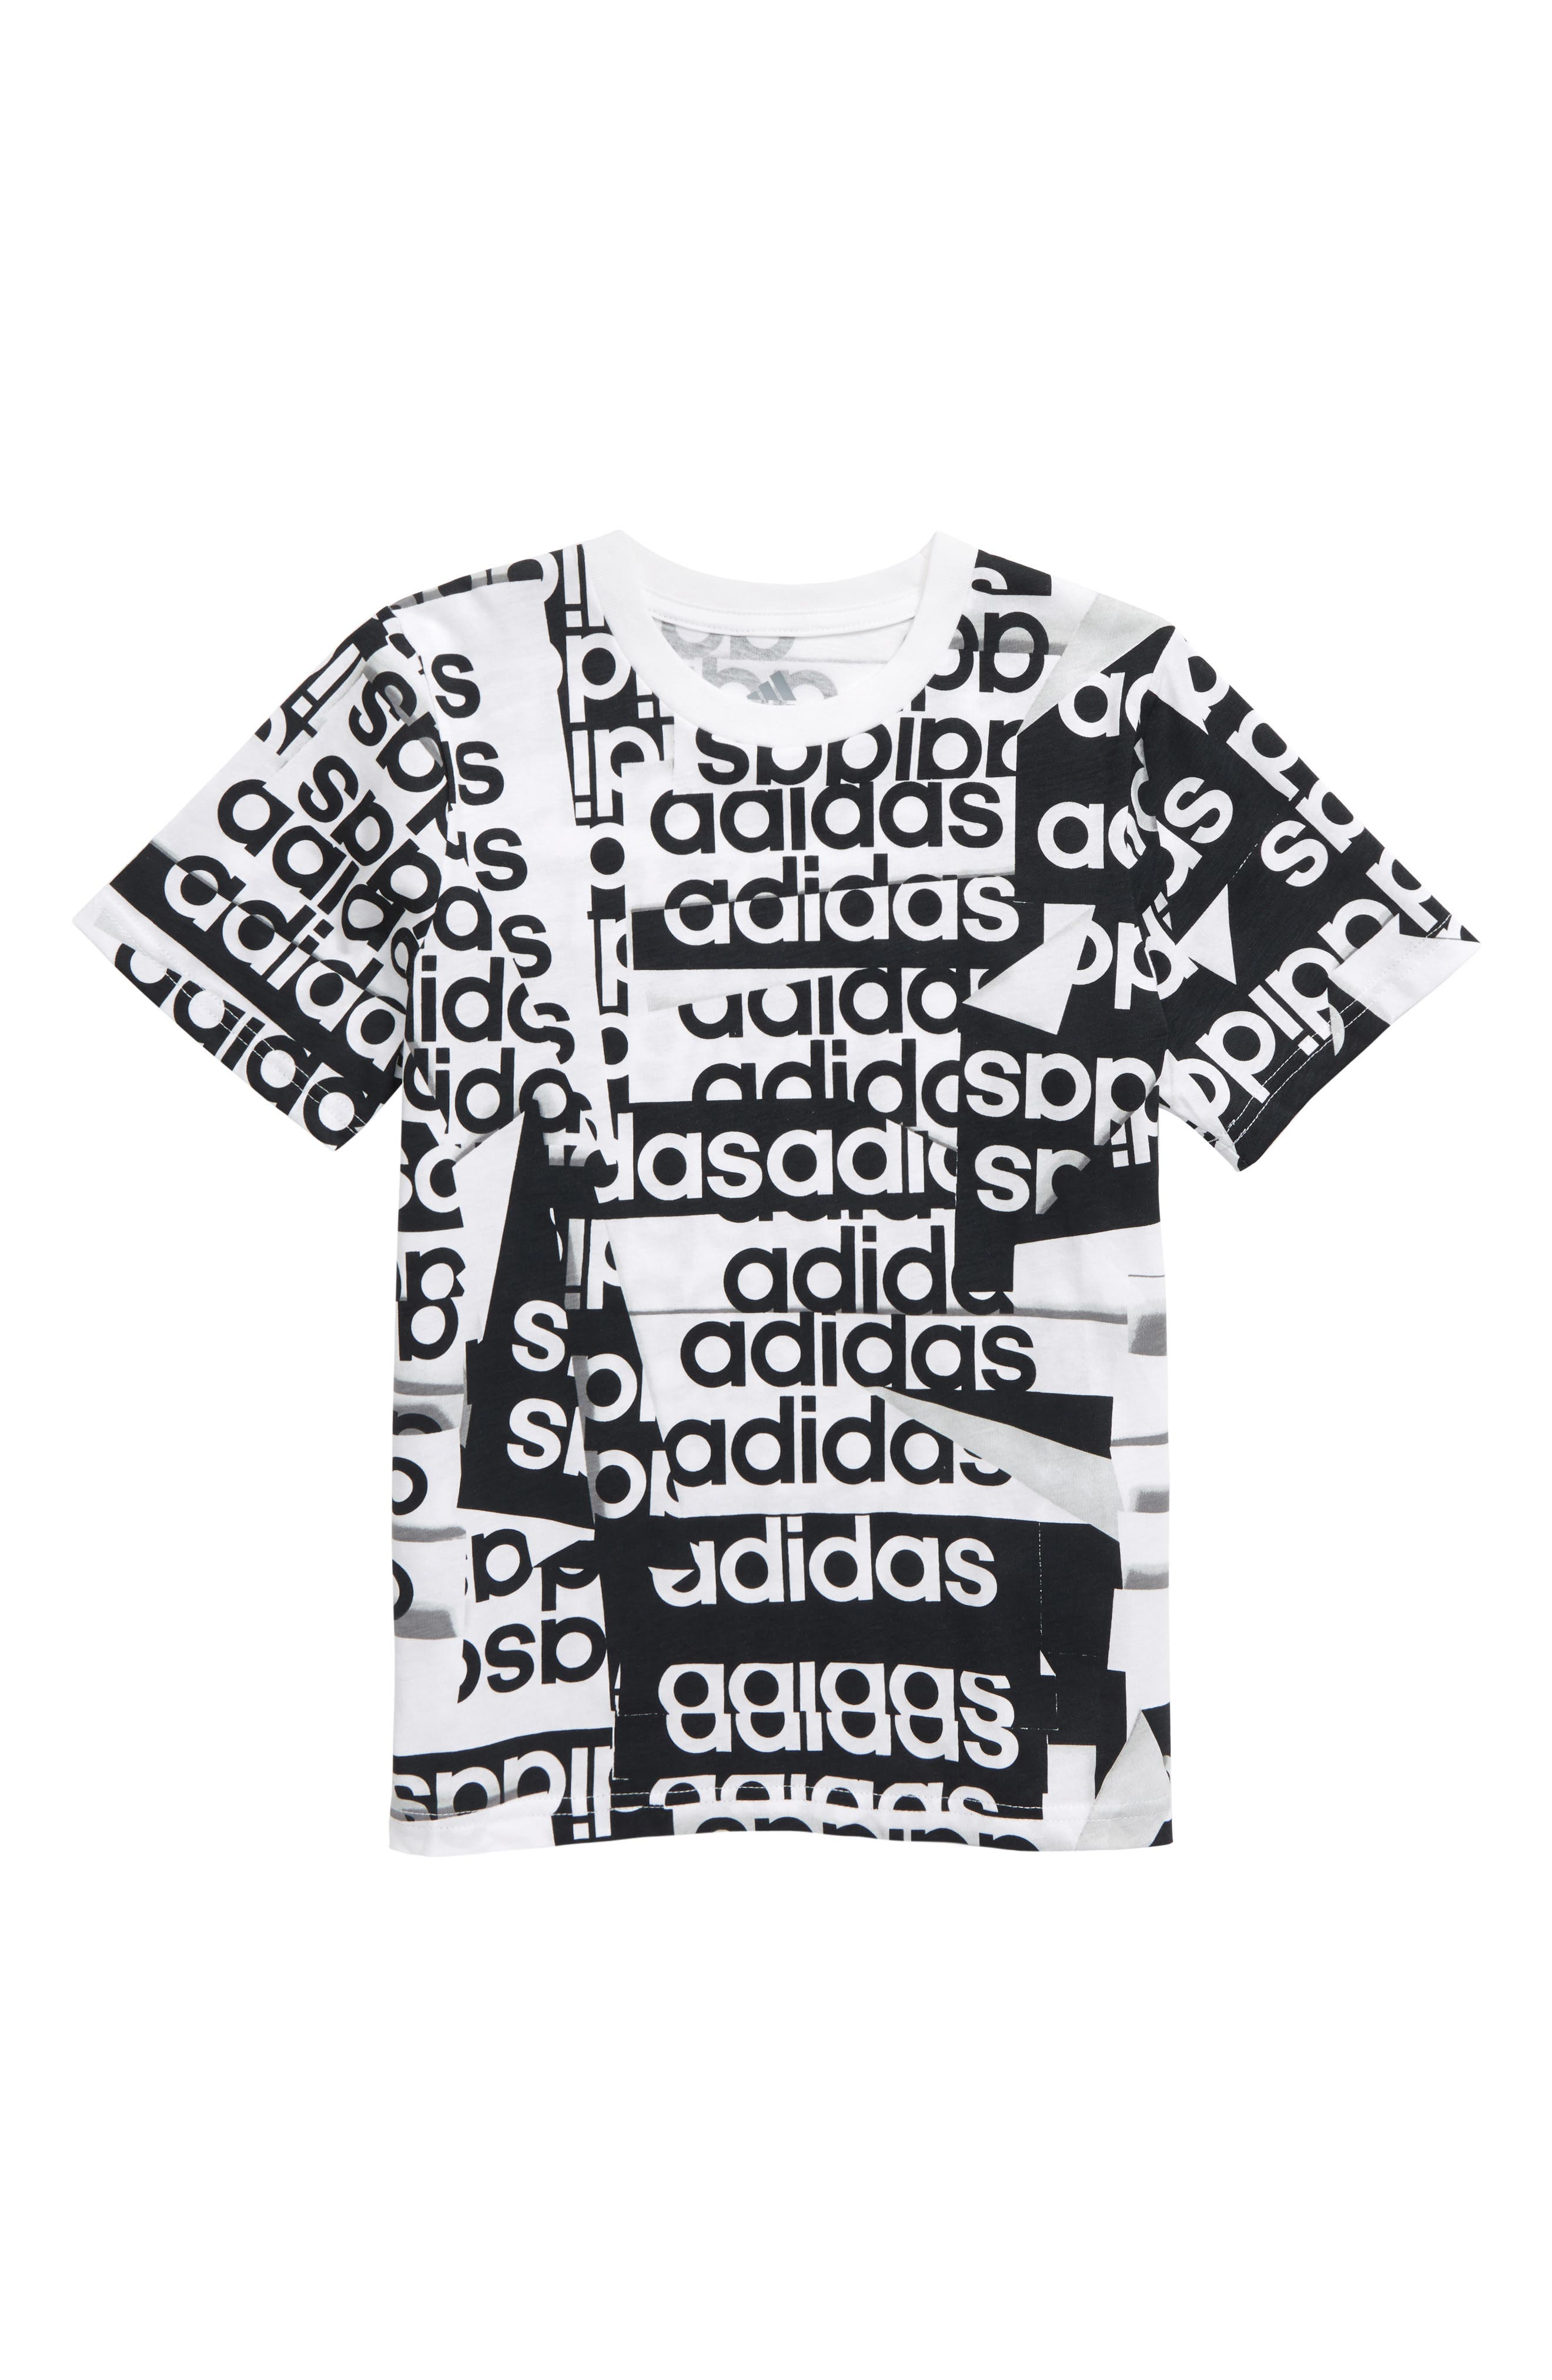 Boys' Adidas Clothing: Hoodies, Shirts, Pants & T Shirts